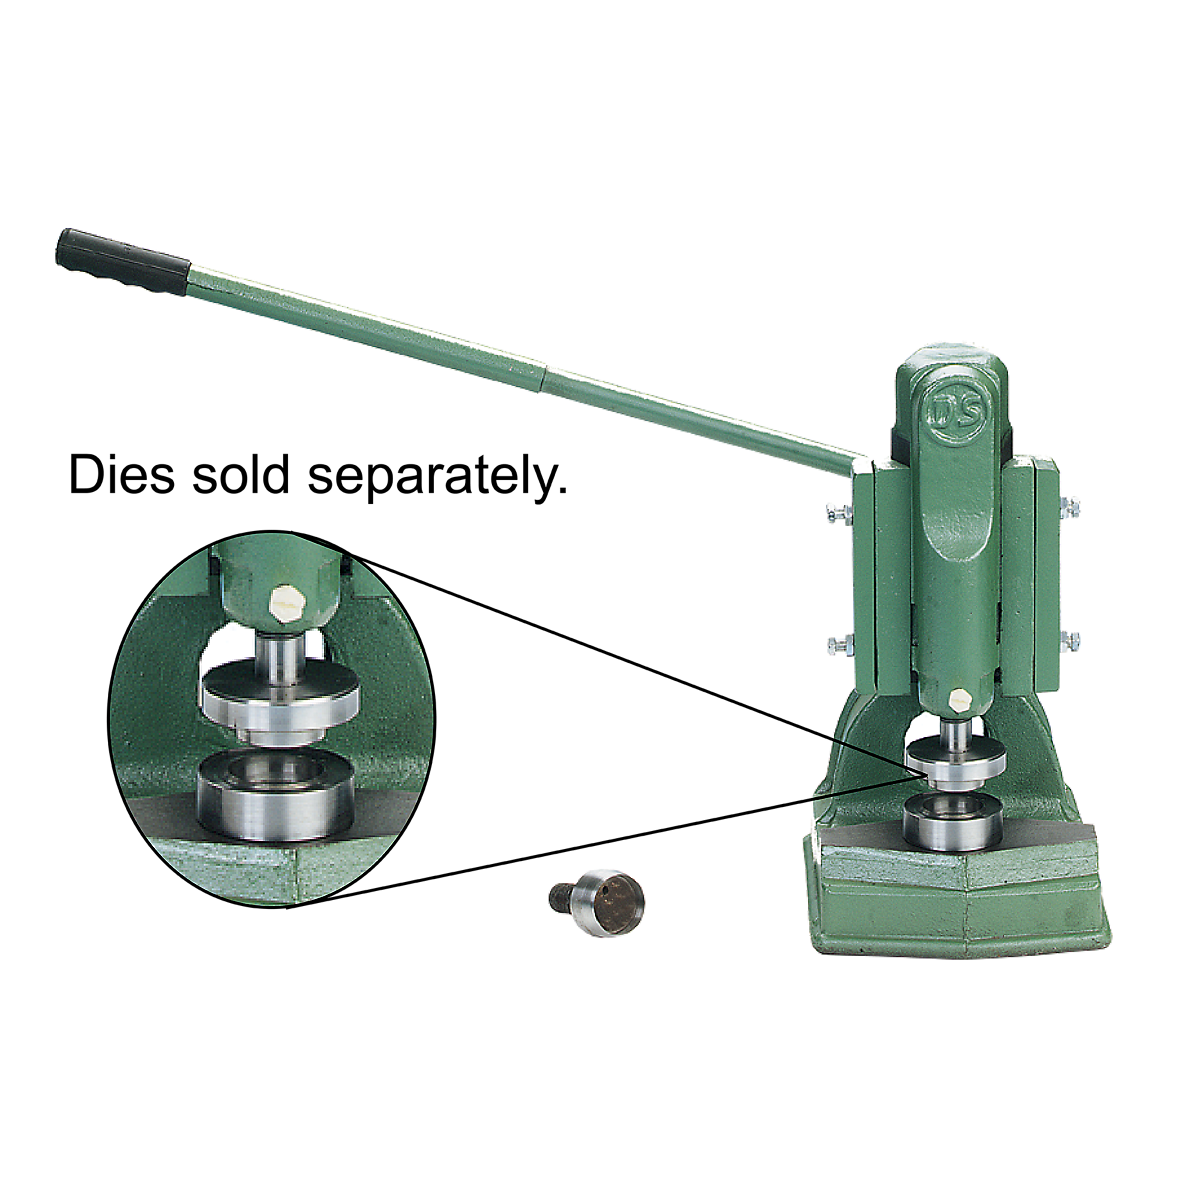 Grommet / Button Press | Rowley